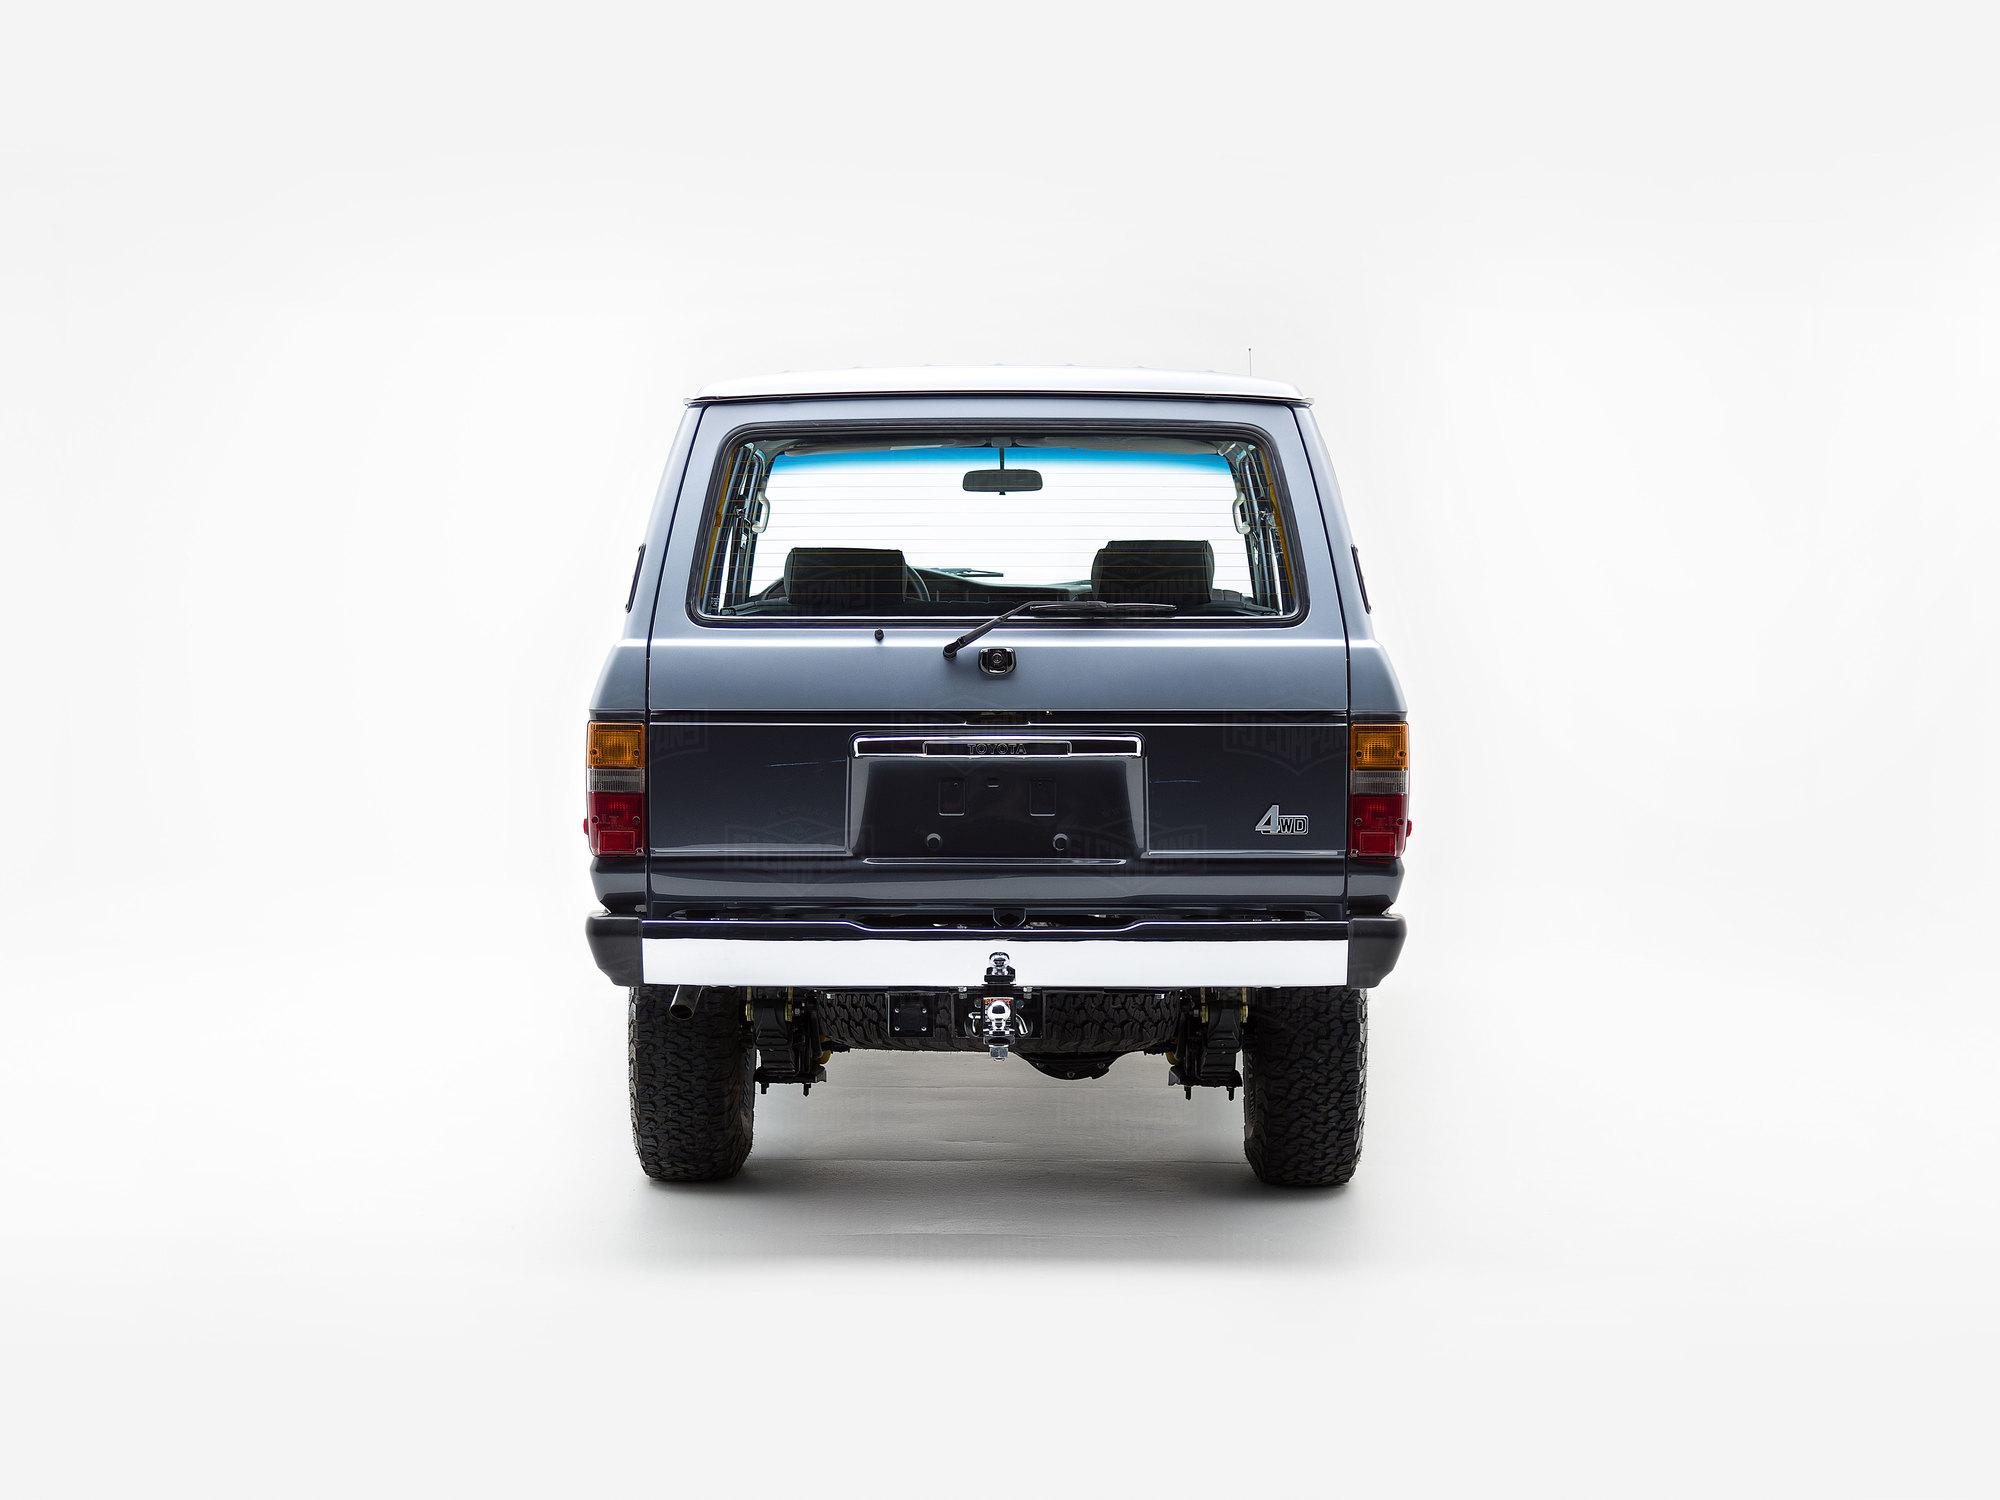 1988 FJ62 - Blue/Silver - FJ62-G8J0088791